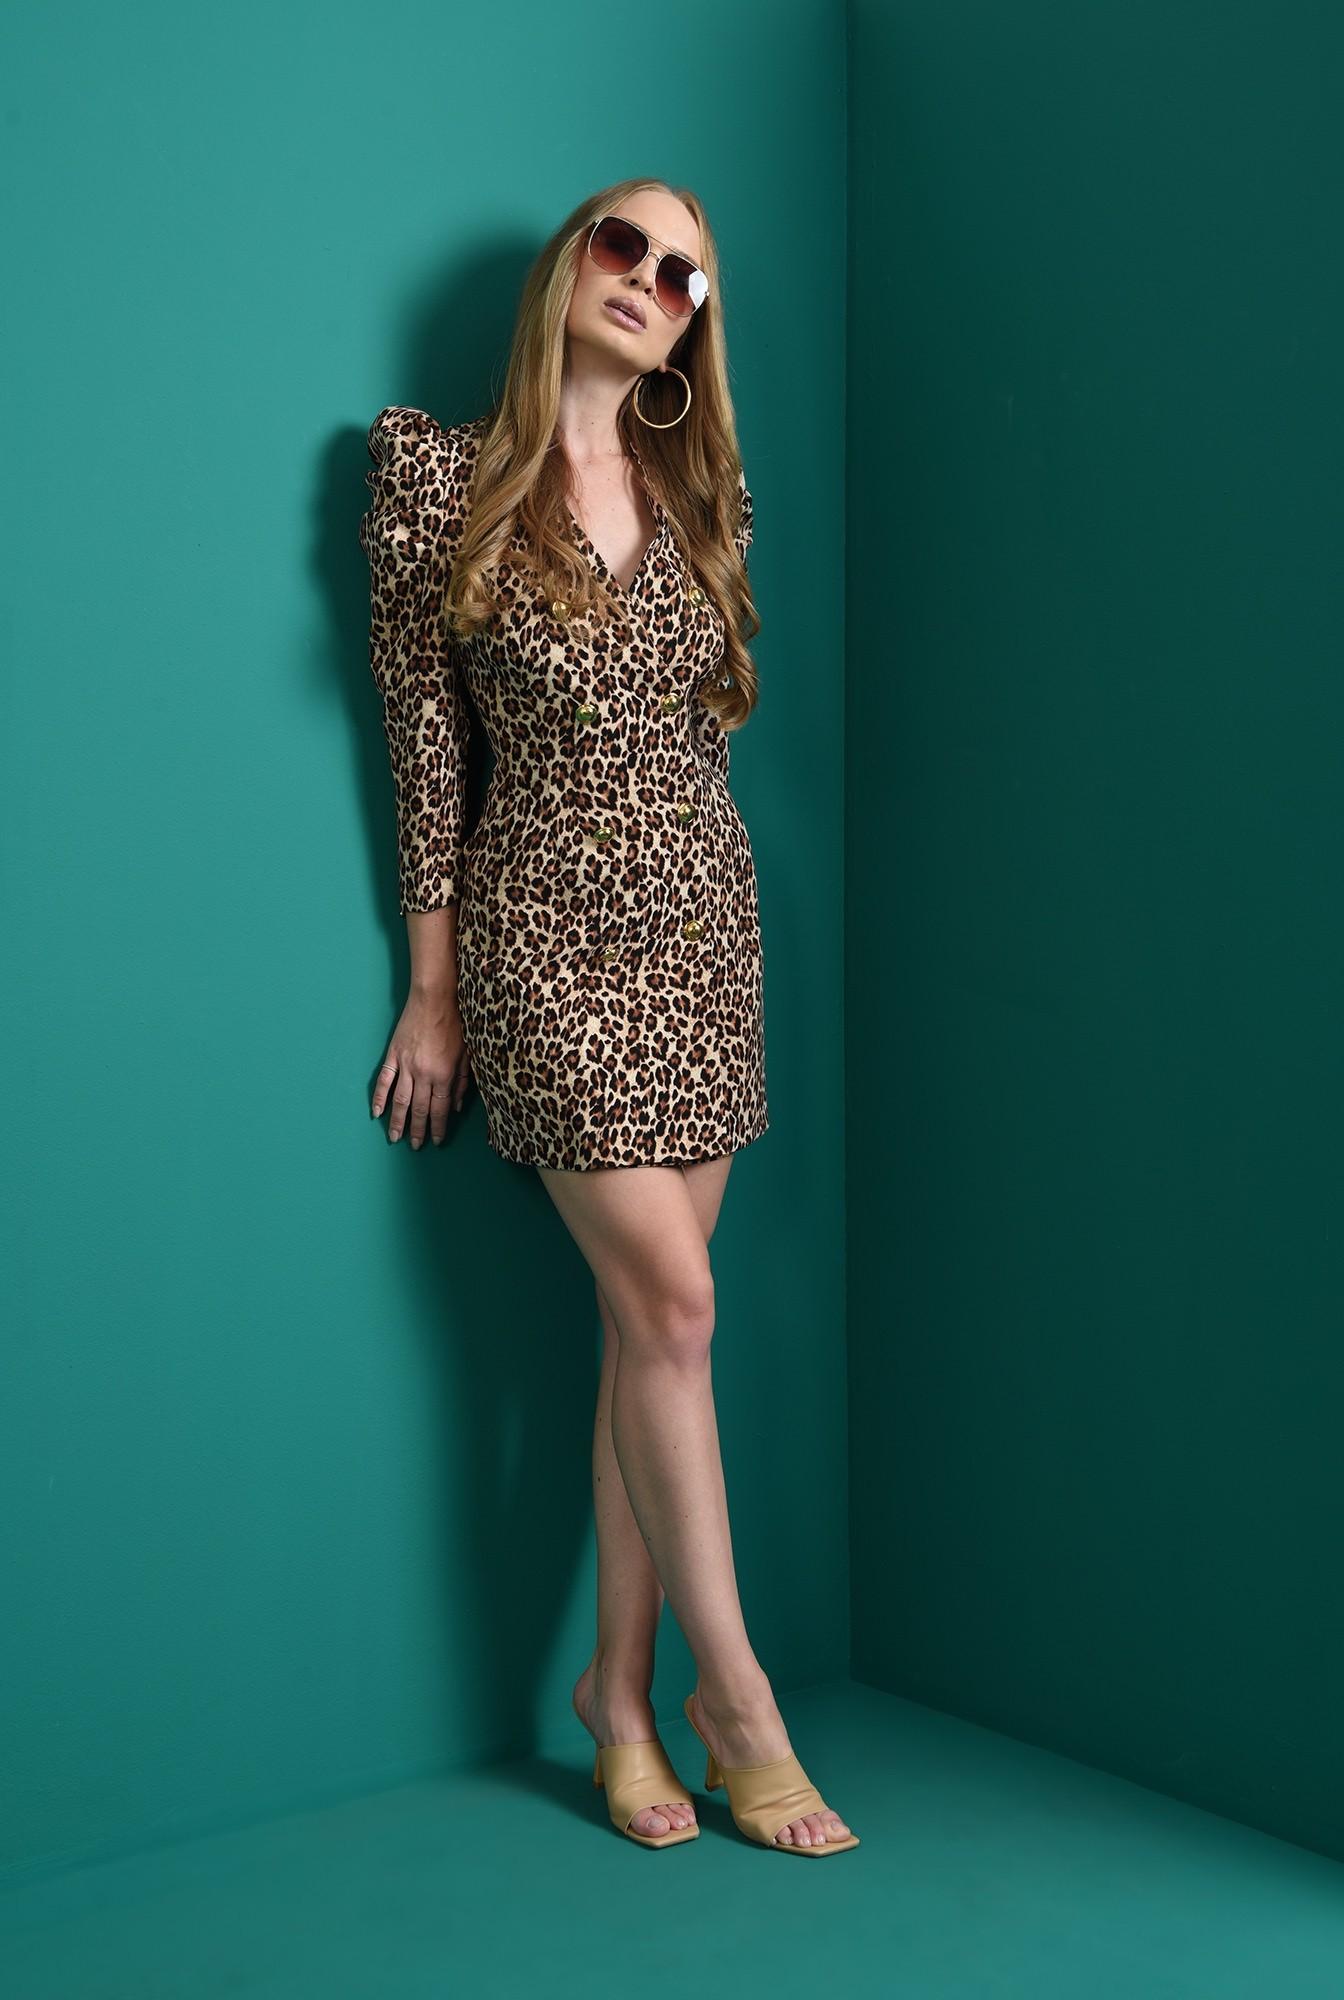 0 - rochie mini, animal print, cu umeri accentuati